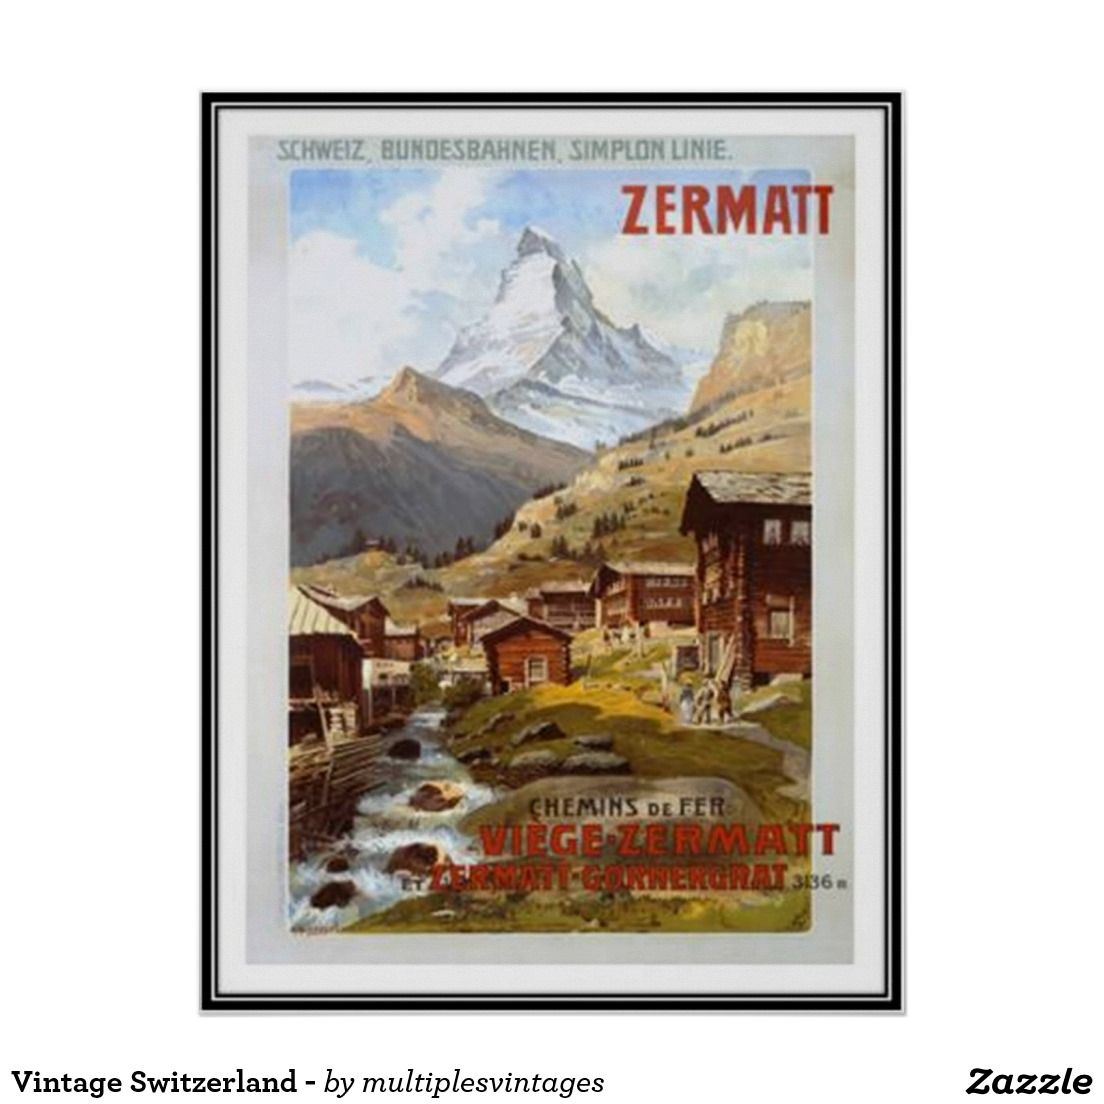 Vintage Switzerland Poster Zazzle Com Vintage Poster Art Vintage Travel Posters Vintage Travel